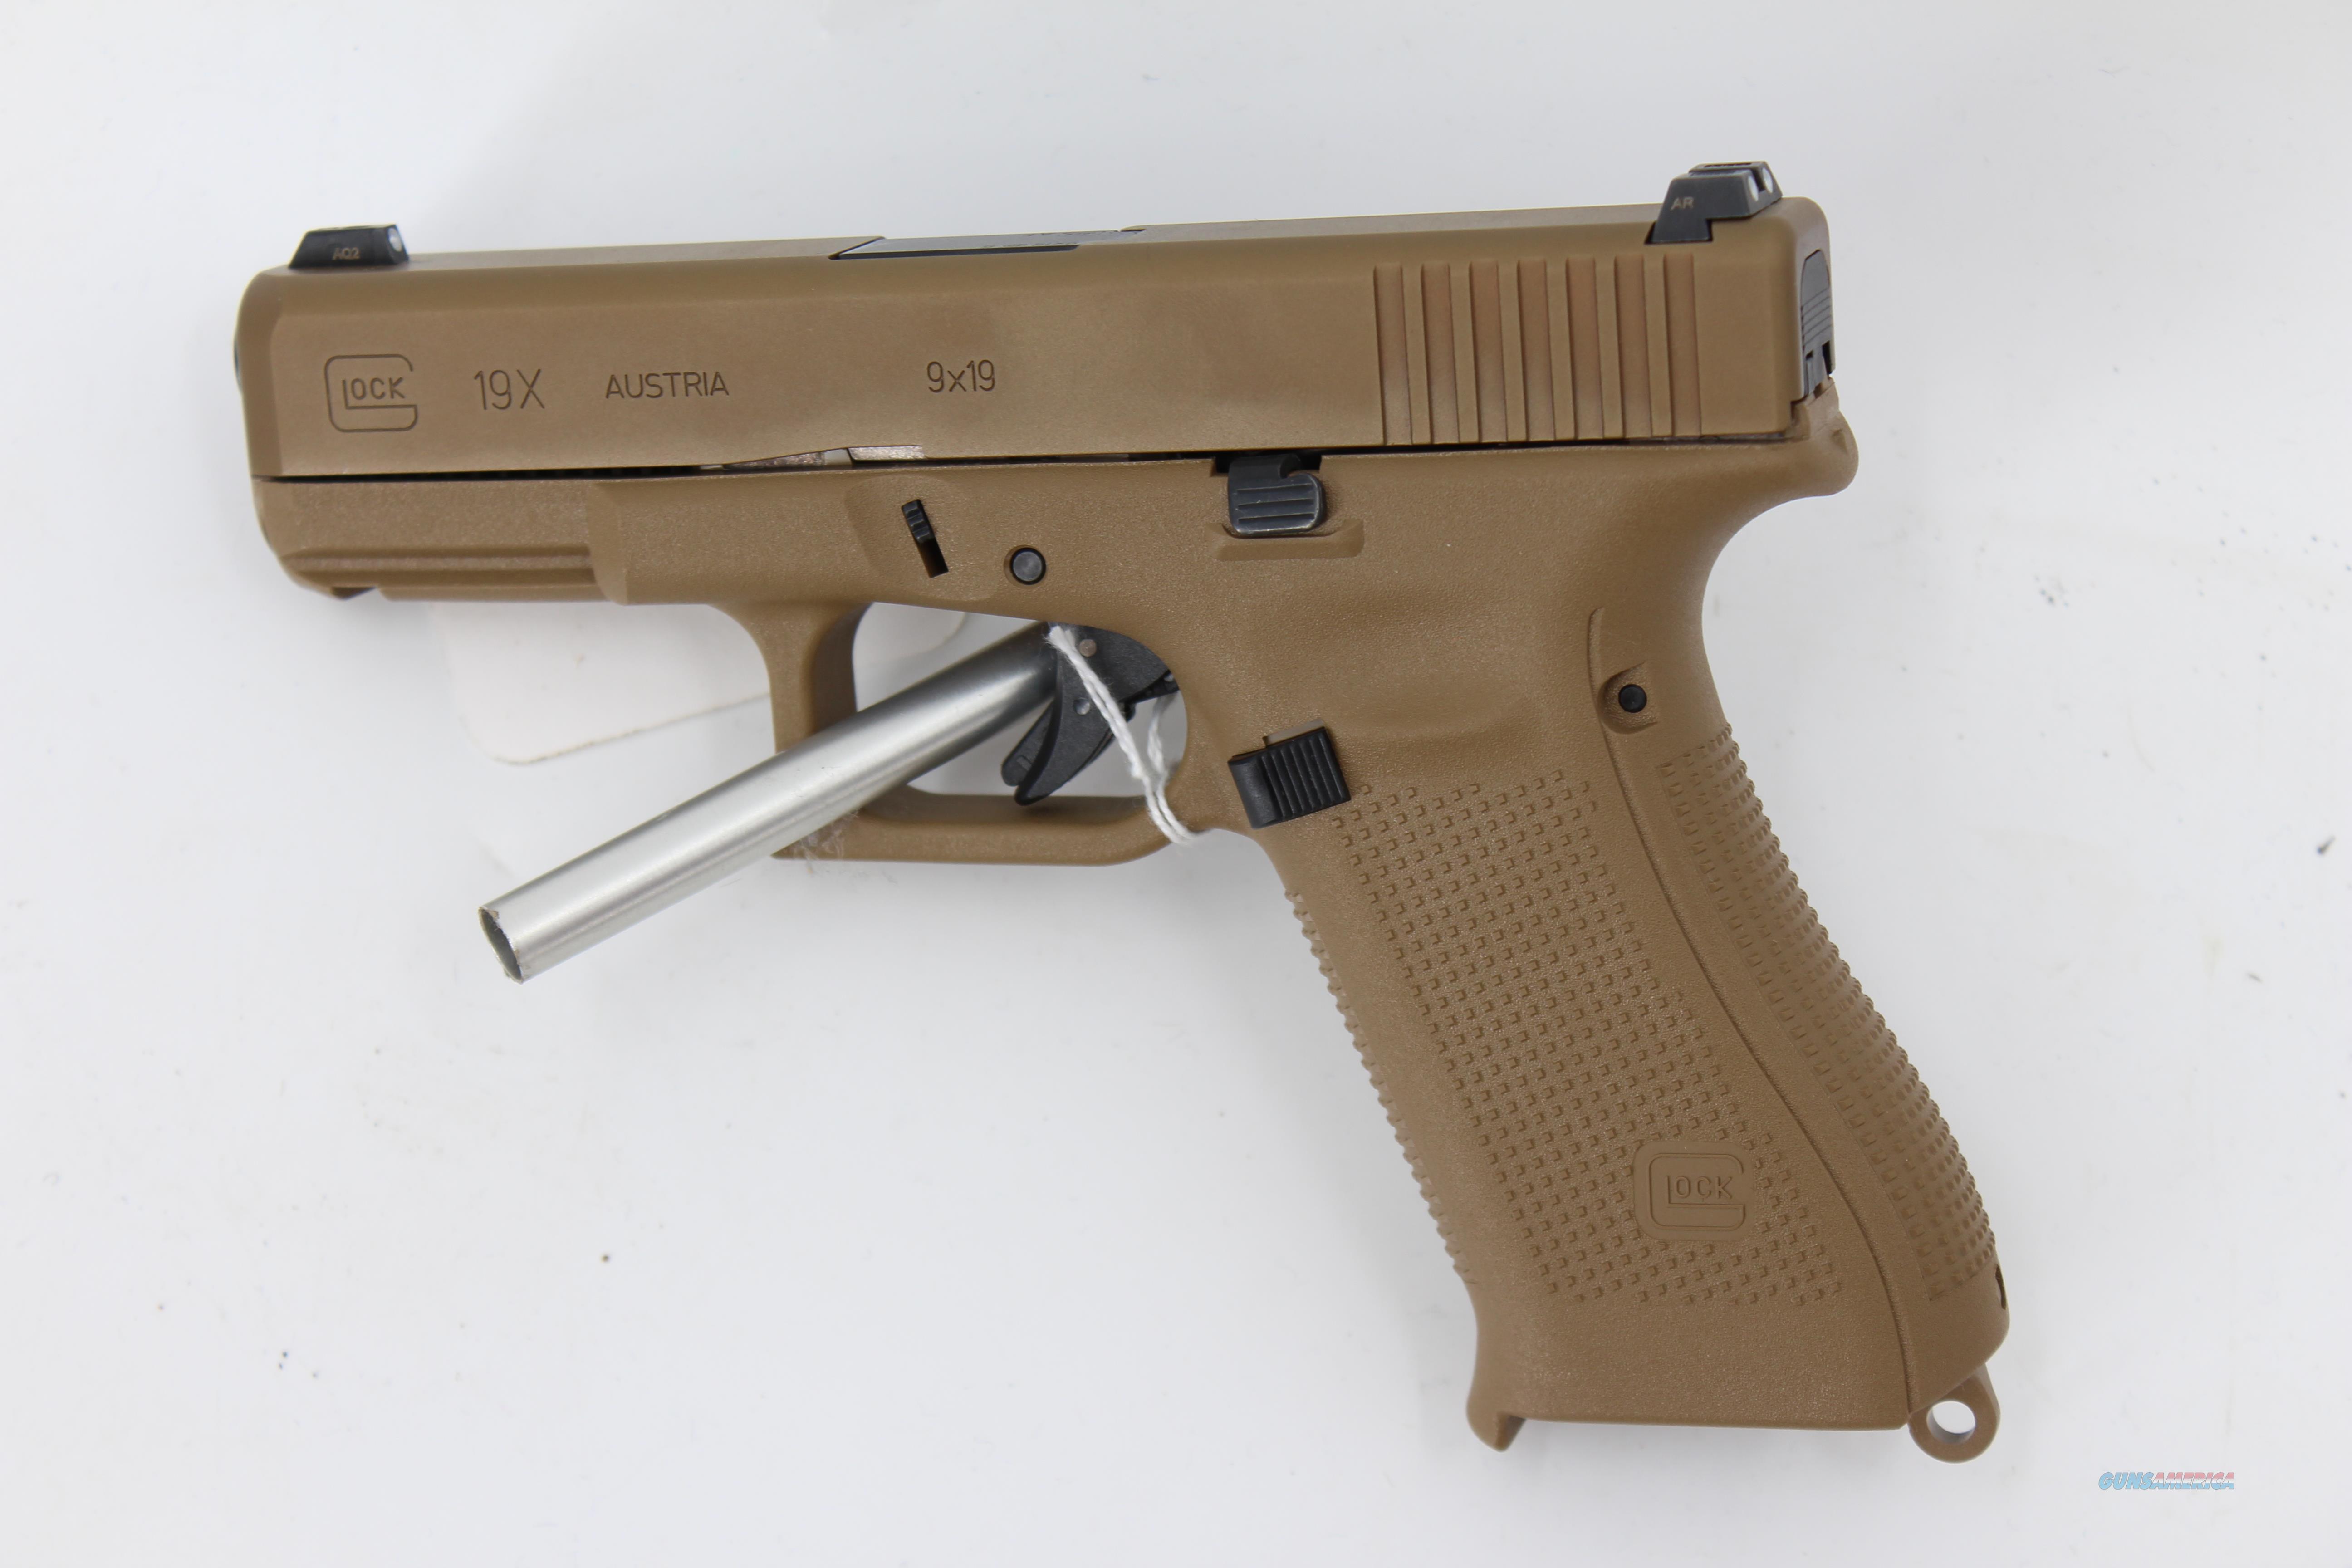 Glock 19X Coyote Tan w/ Night Sights and 3 mags  Guns > Pistols > Glock Pistols > 19